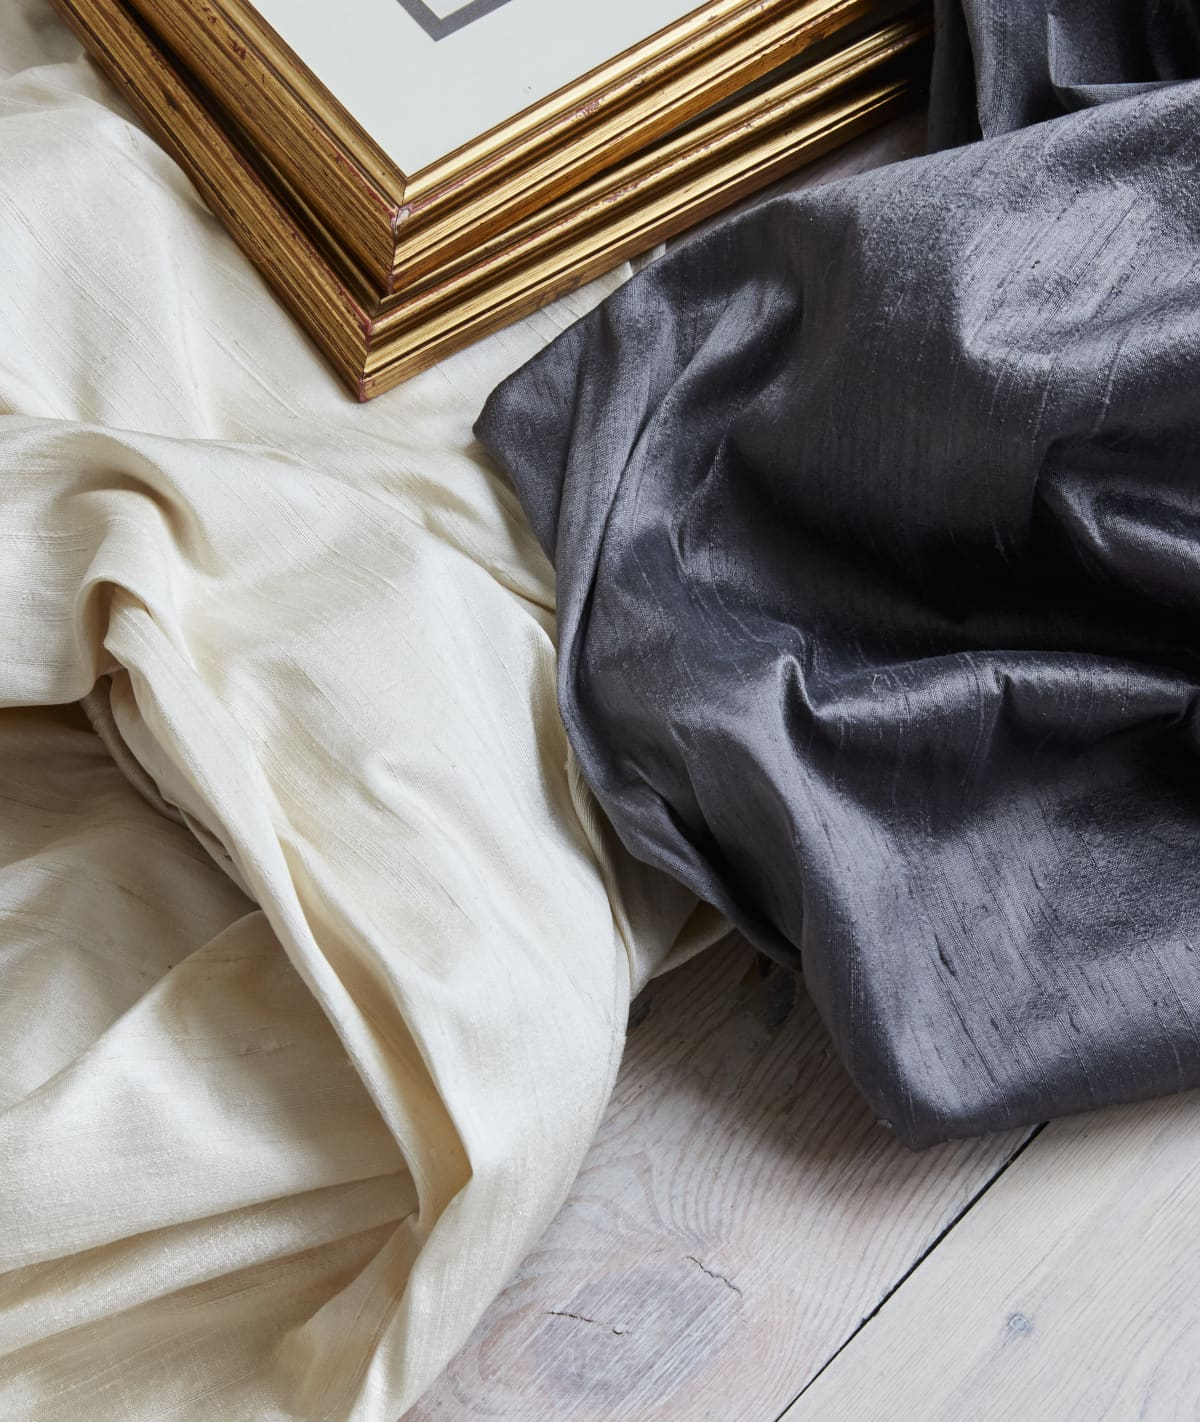 Stitched Gunmetal Grey & Pearl White Silk Curtains